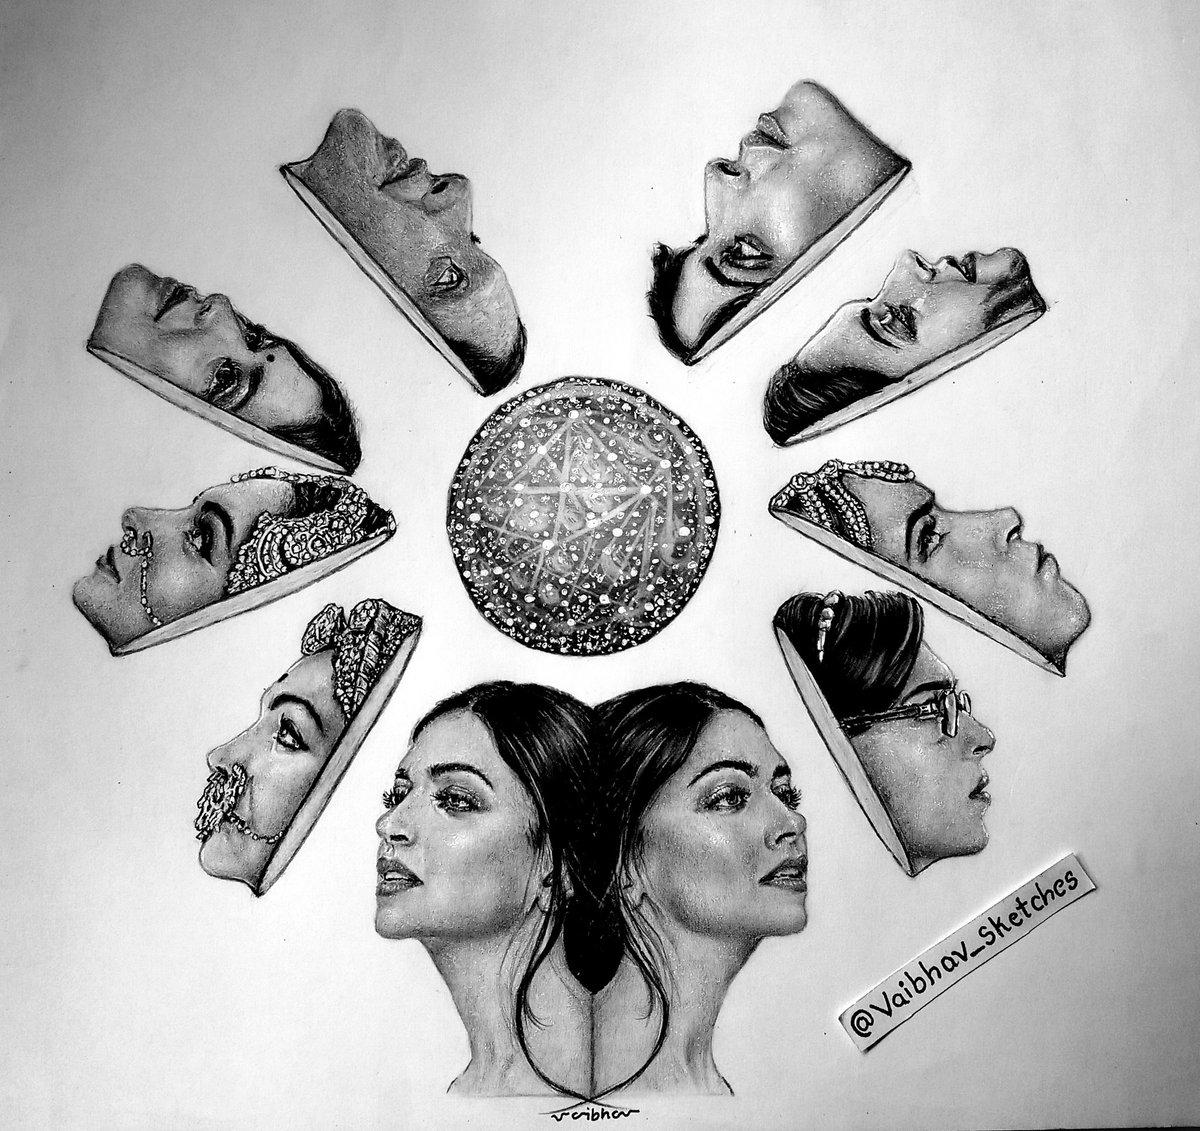 A Real life role and many Reel Life roles - Deepika Padukone  From Piku to Romi Bhatia !! Artwork by me#DeepikaPadukone #RomiBhatia #Malti #Padmavati #Mastani #Leela #Meenamma #Naina #Piku #pencilart pic.twitter.com/ITW3Q4HjdD